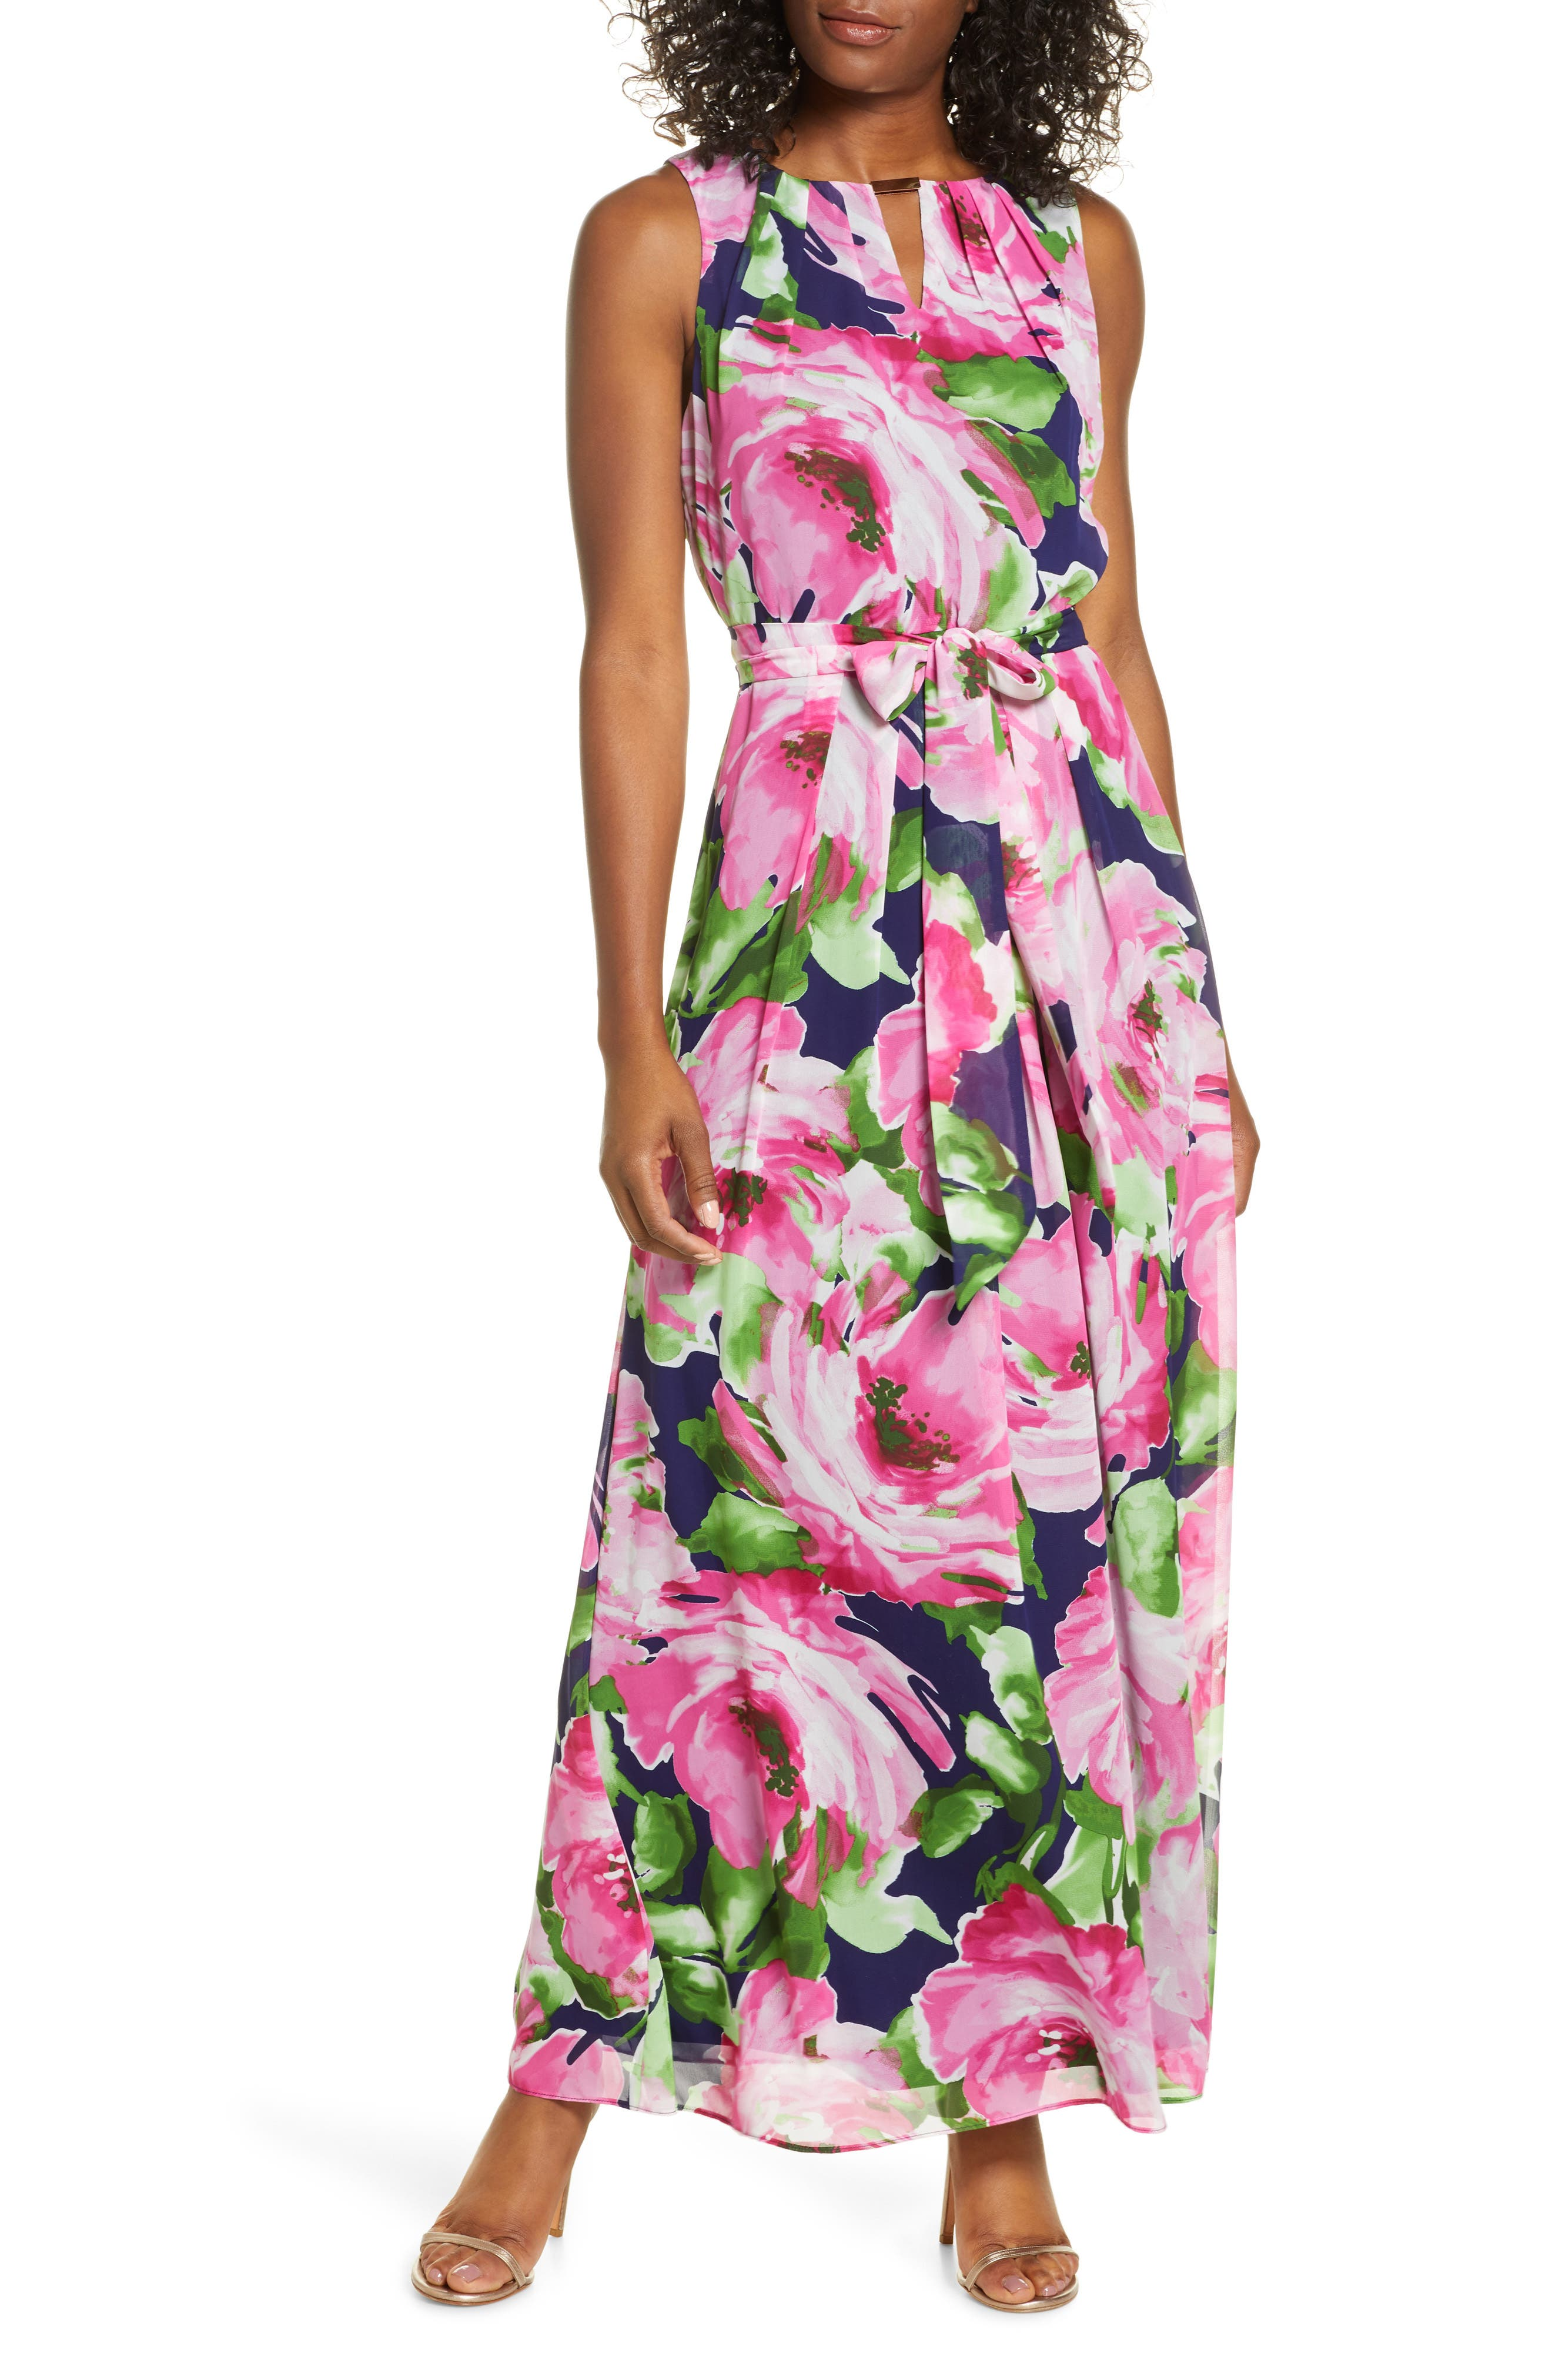 Image of Donna Ricco Abstract Floral Print Sleeveless Maxi Dress